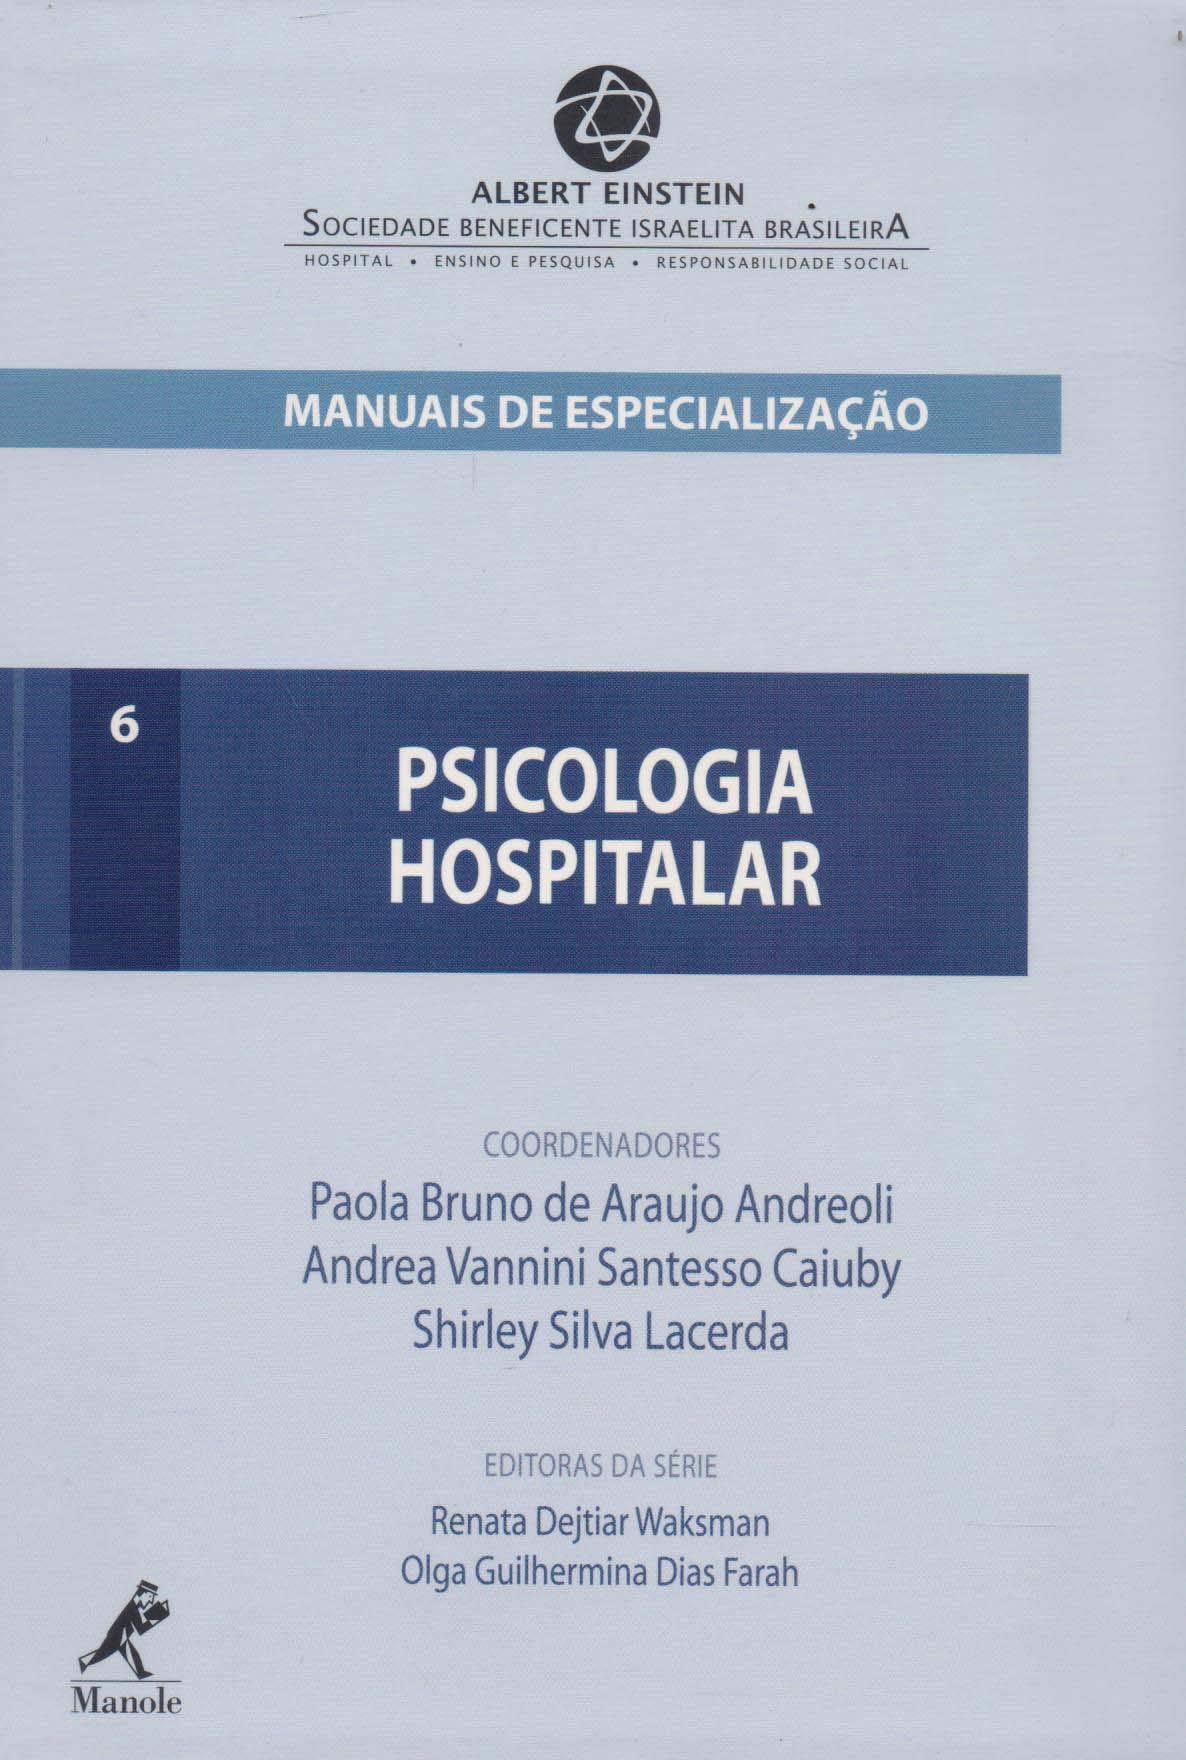 Download Psicologia Hospitalar - Vol.6 - Serie Manuais de Especializacao Einstein pdf epub